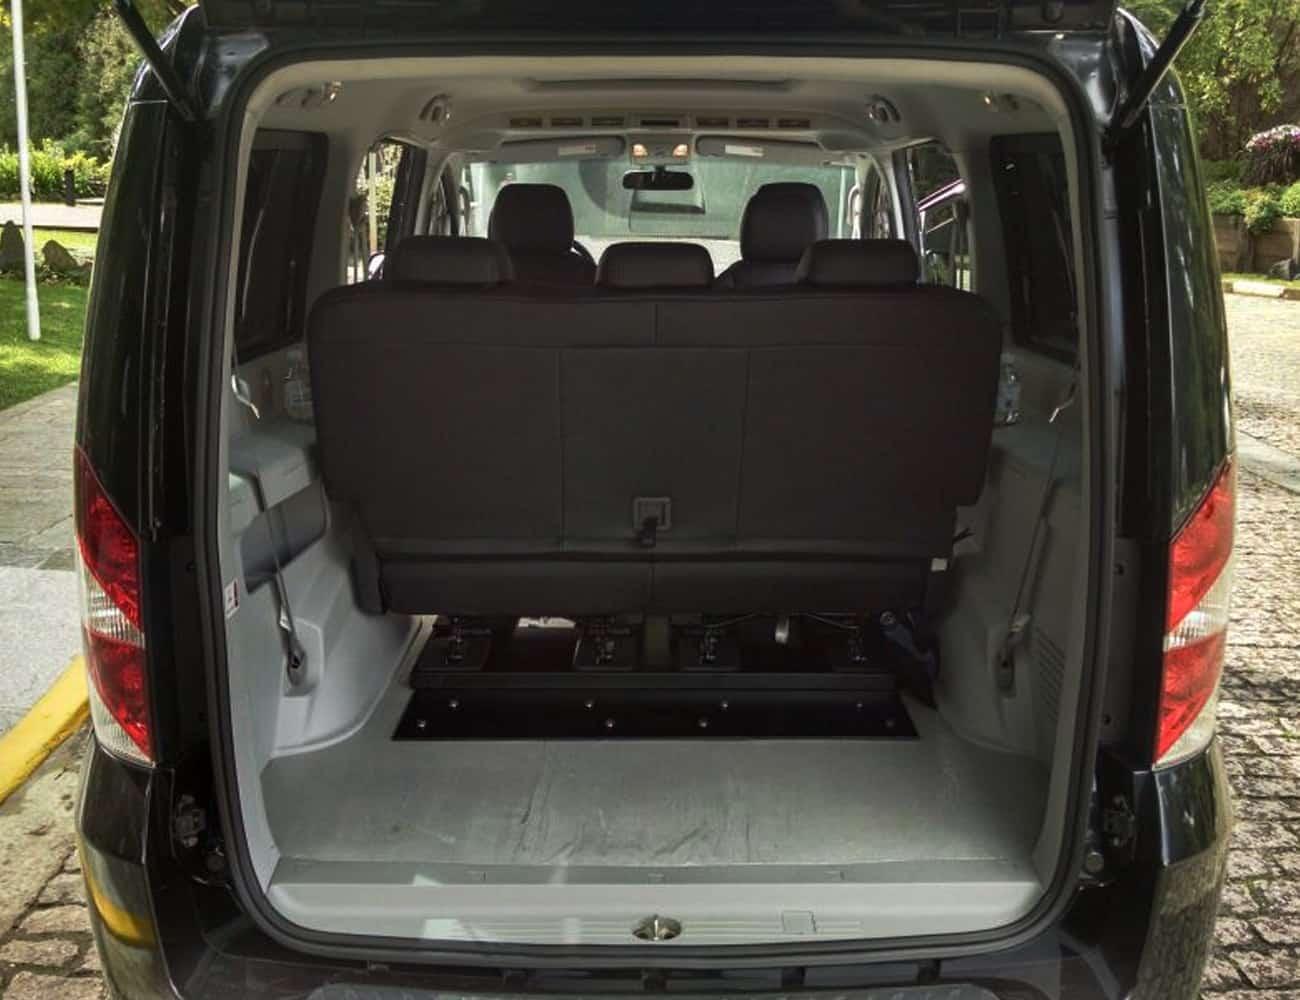 Minivan jac t8 para consulados e empresas business